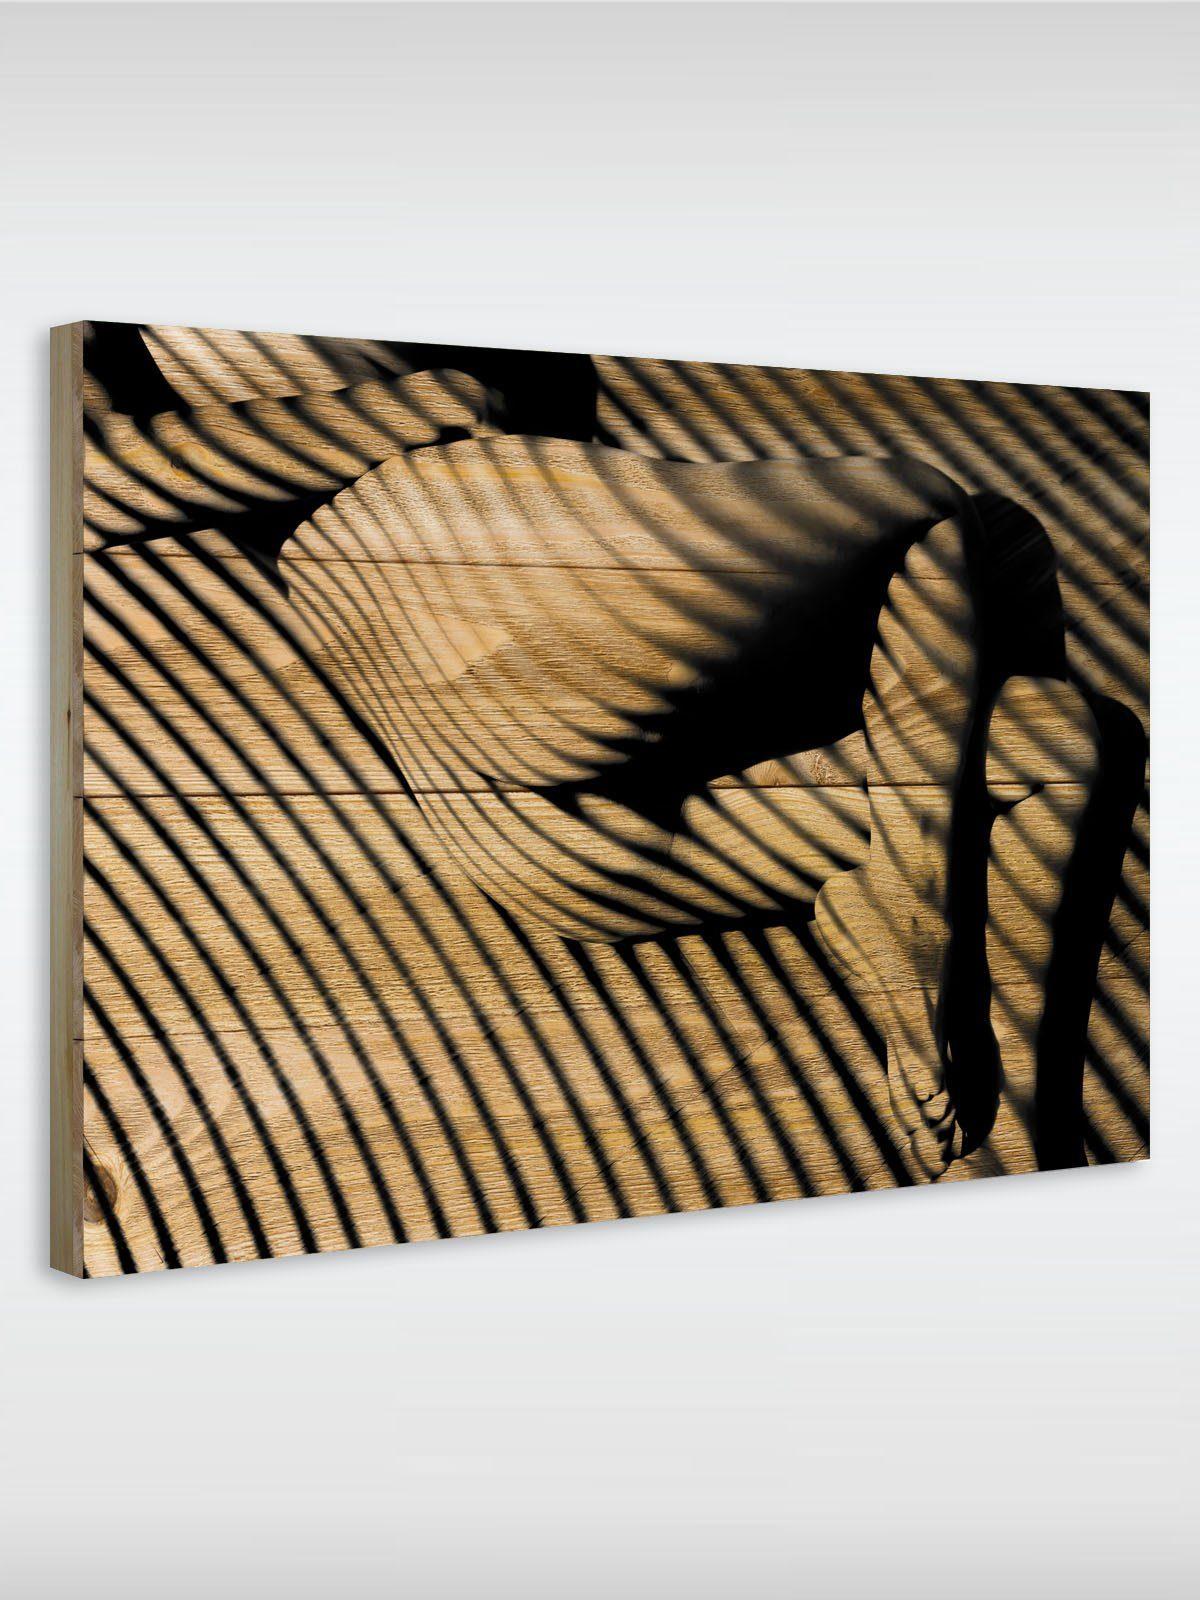 roombird Massiv-Holz Bild mit Druck in den Maßen 50 x 70 cm. »Holzbild Naked Girl 50 x 70 cm«